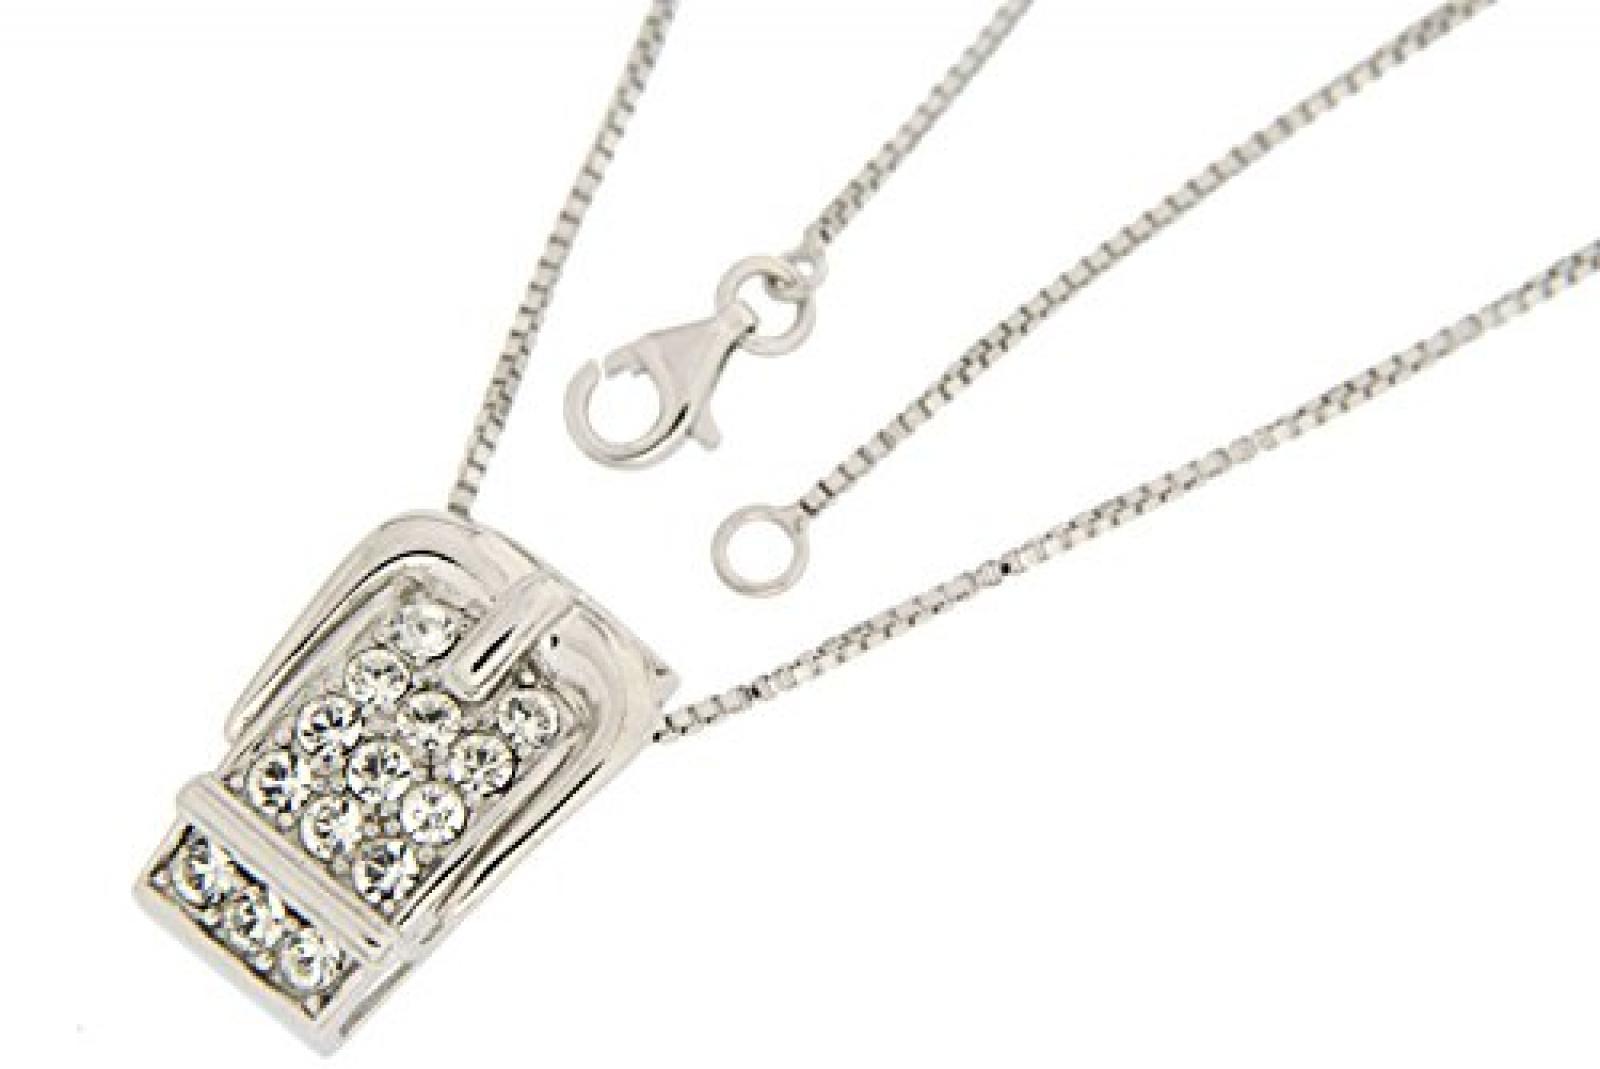 Kettenworld Damen-Kette Sterling-Silber 925 45cm FA454179245.0K